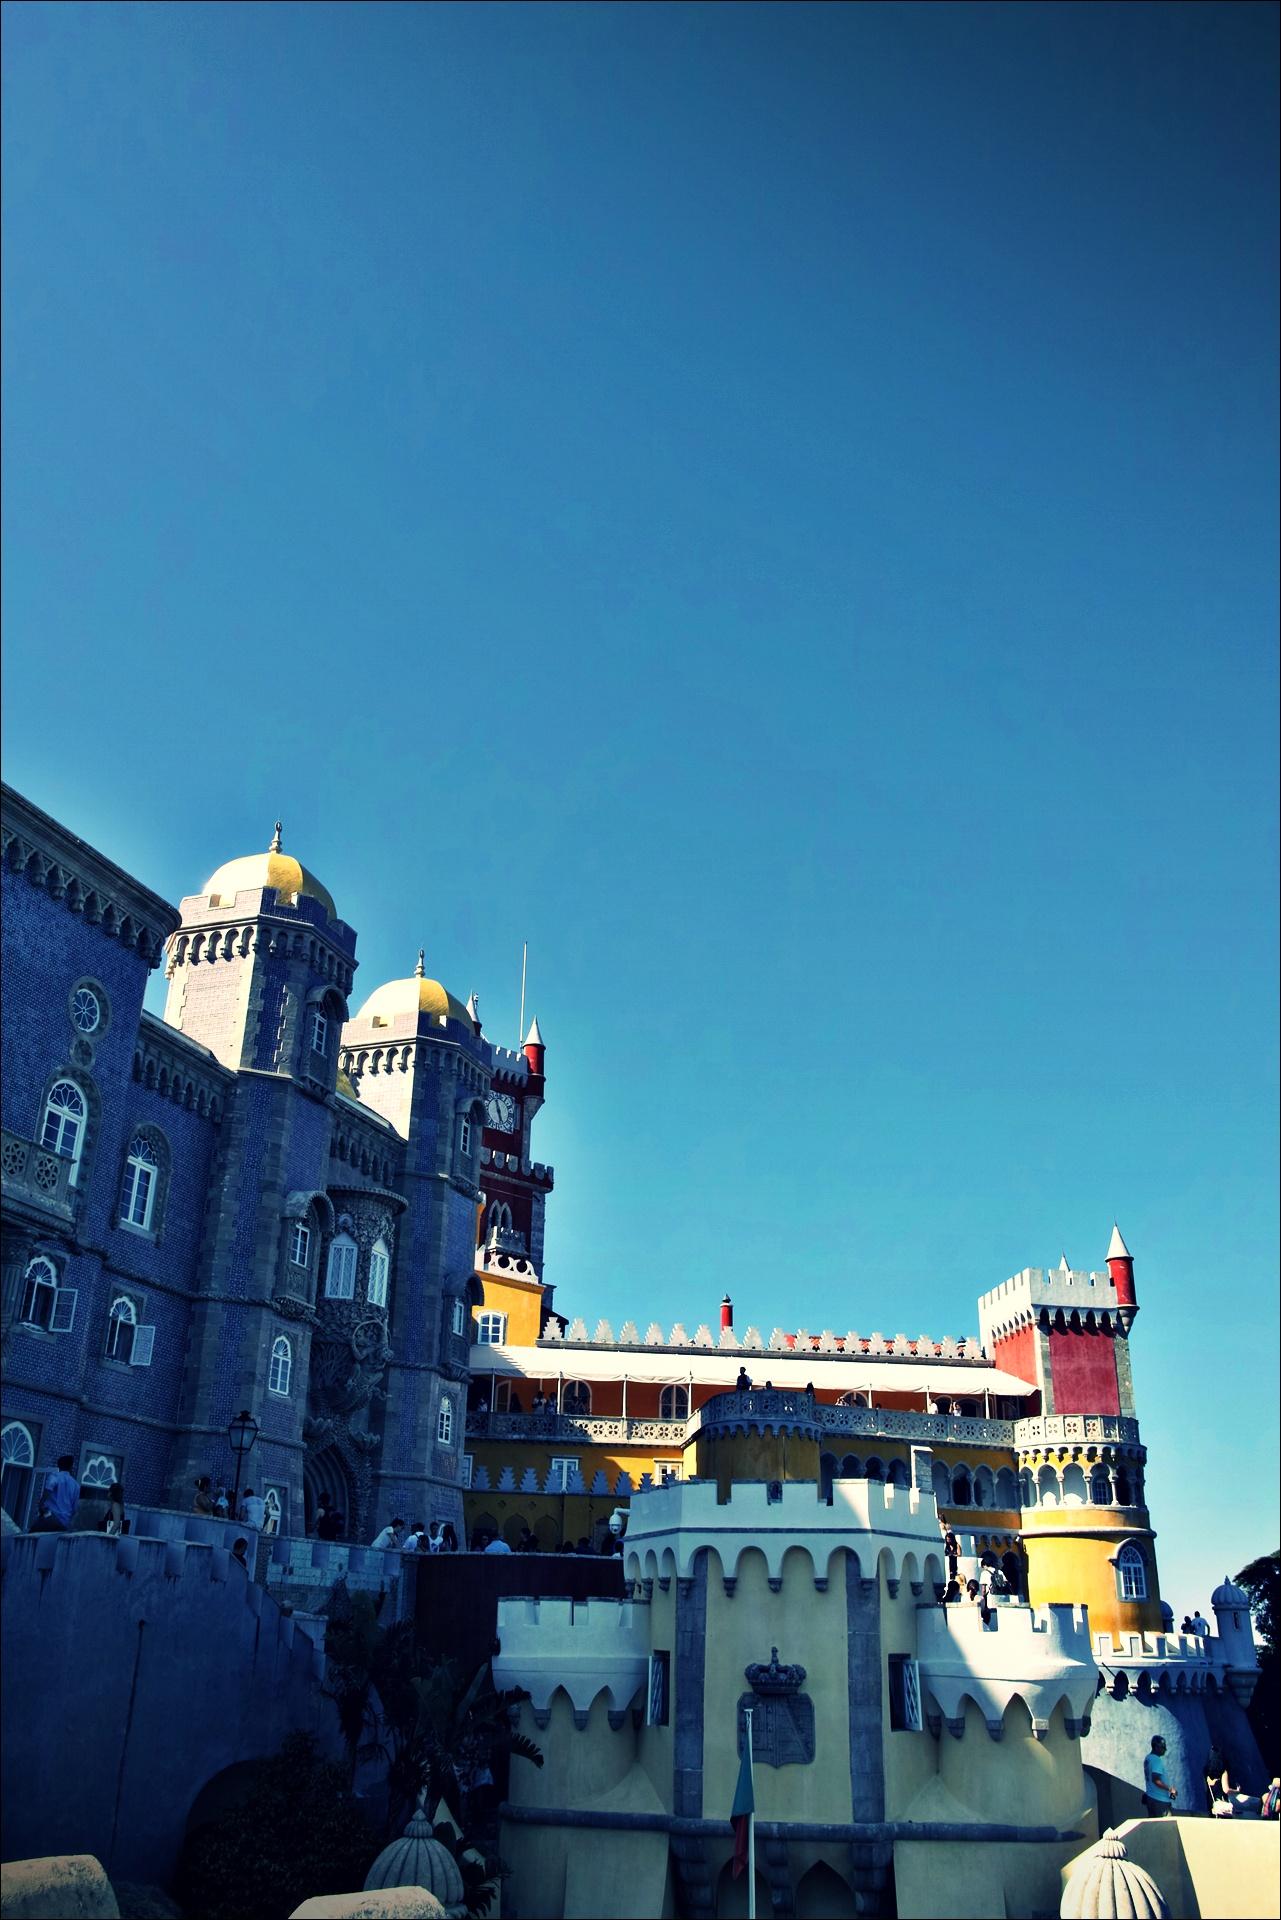 성-'페나 성 Parque e Palácio Nacional da Pena'